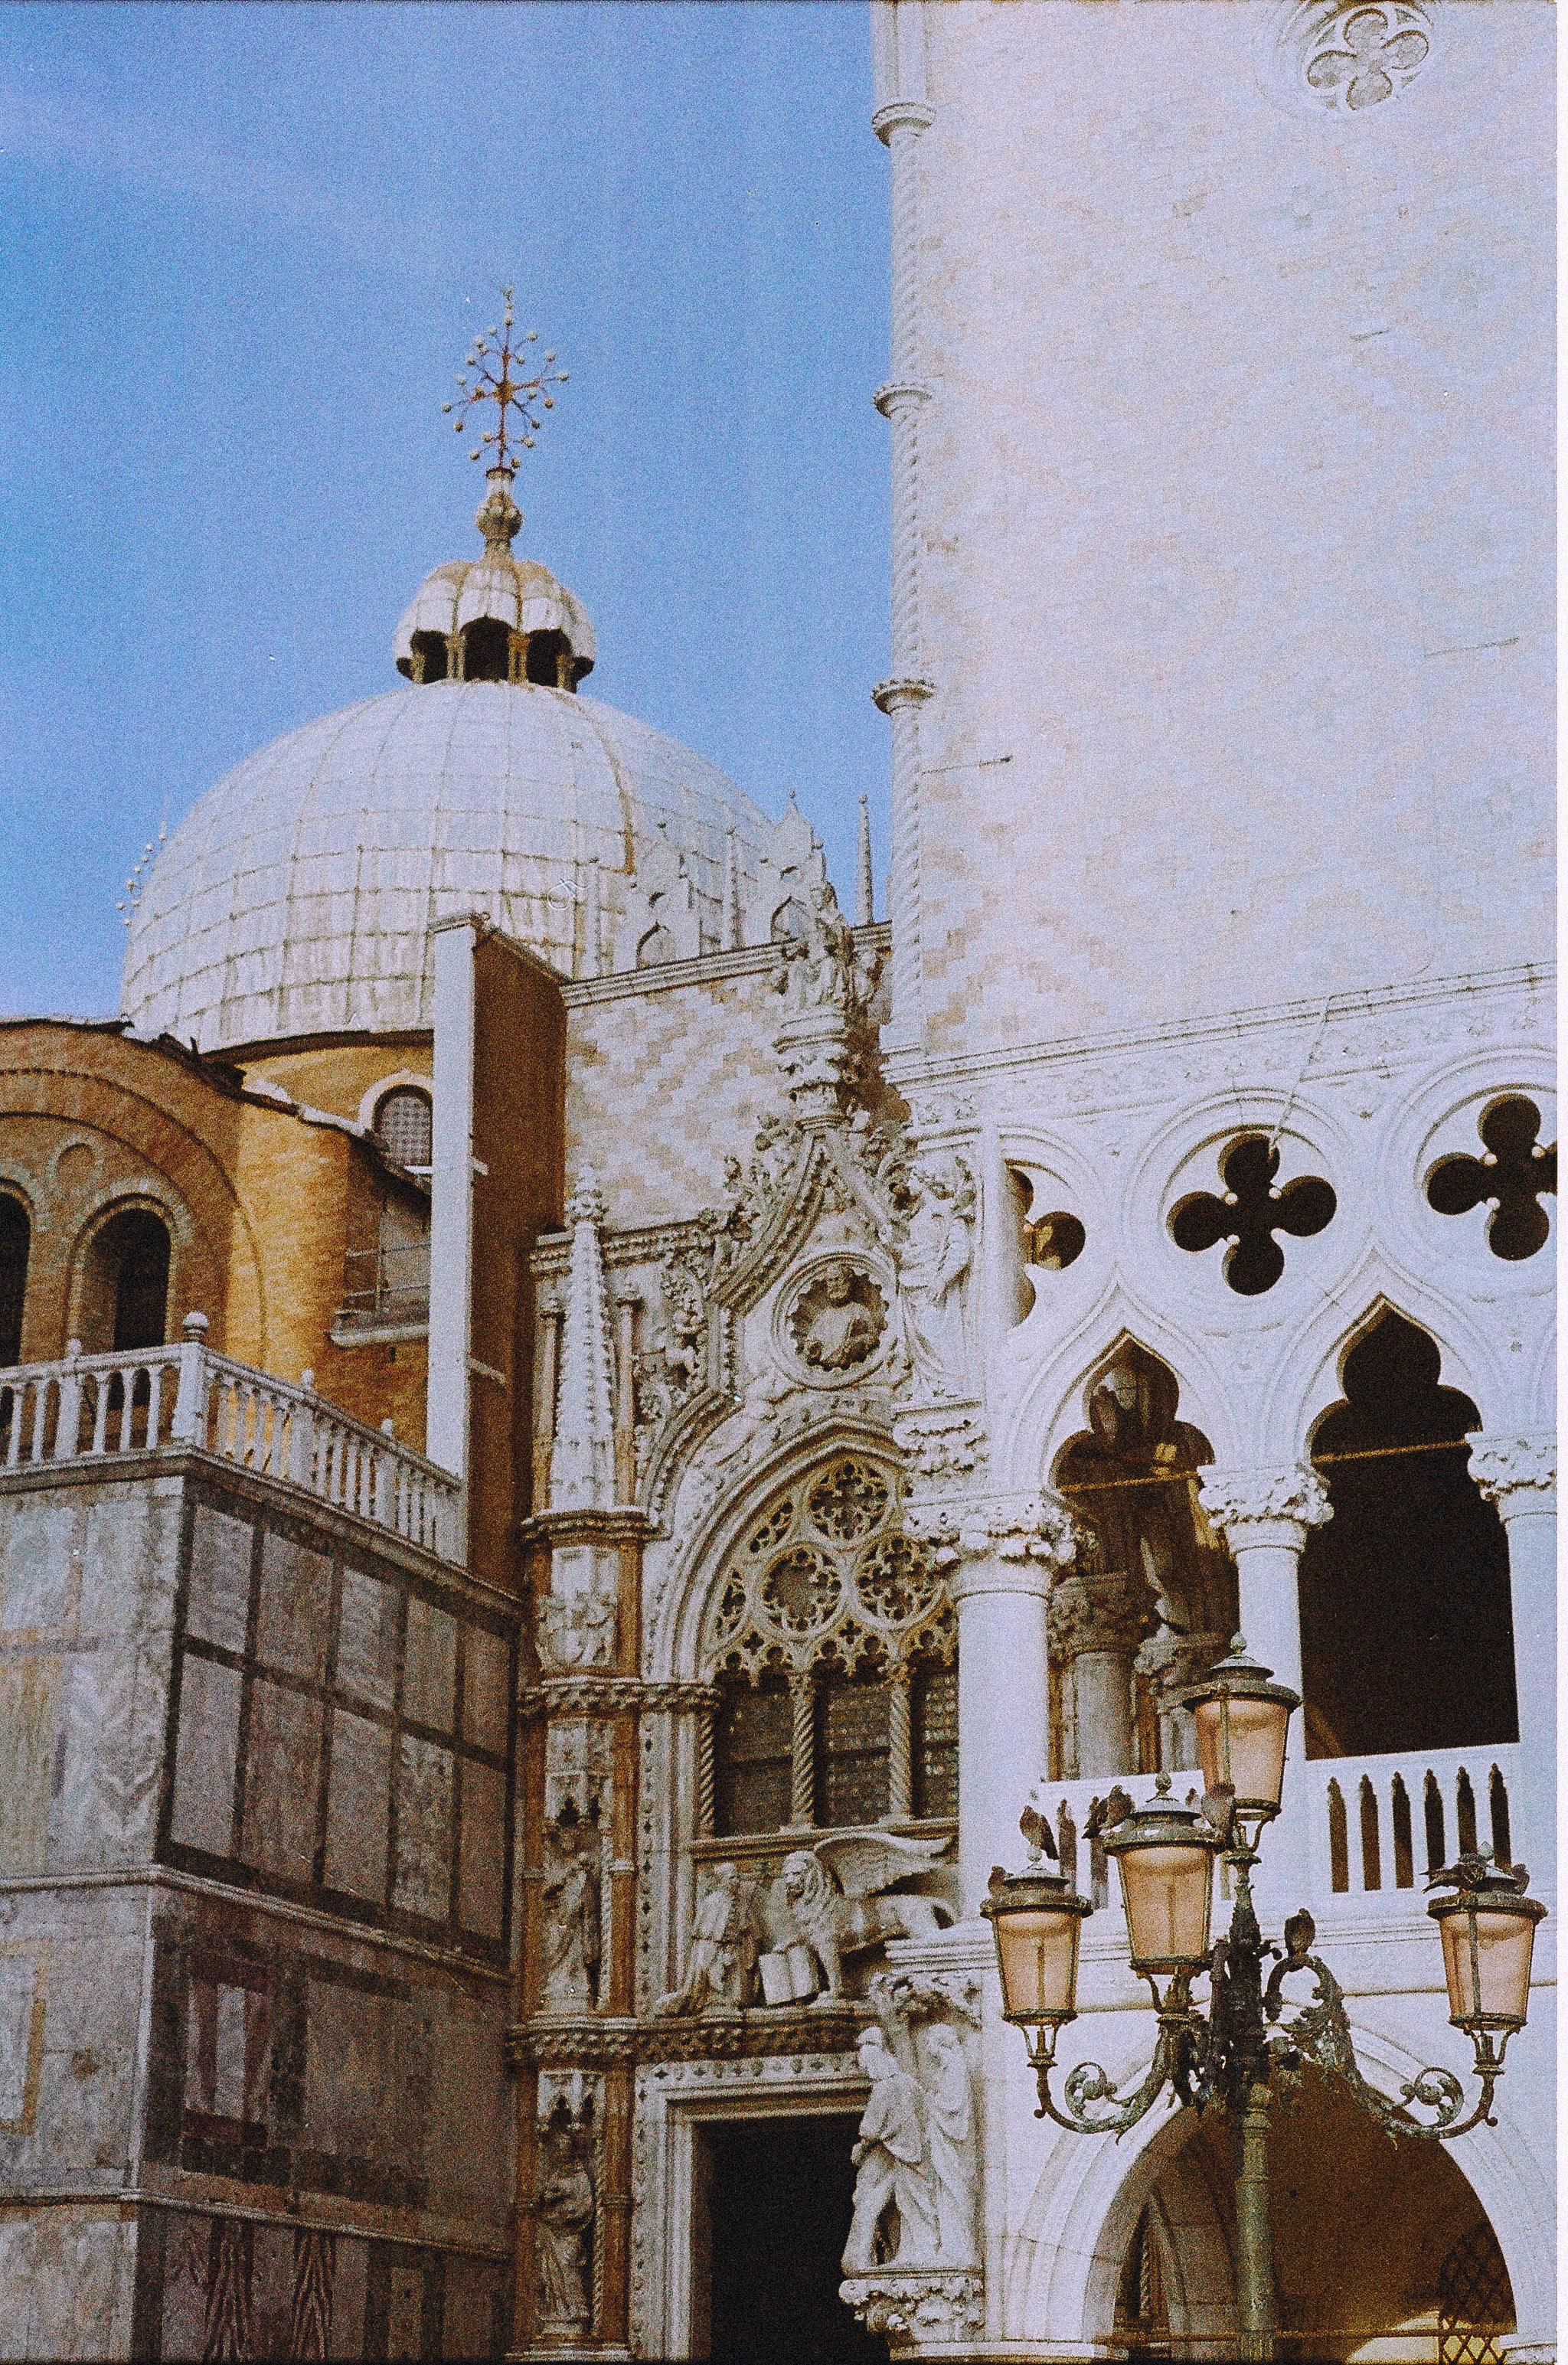 Lesly Lotha_Venice_Italy_Film Photography 04.jpg